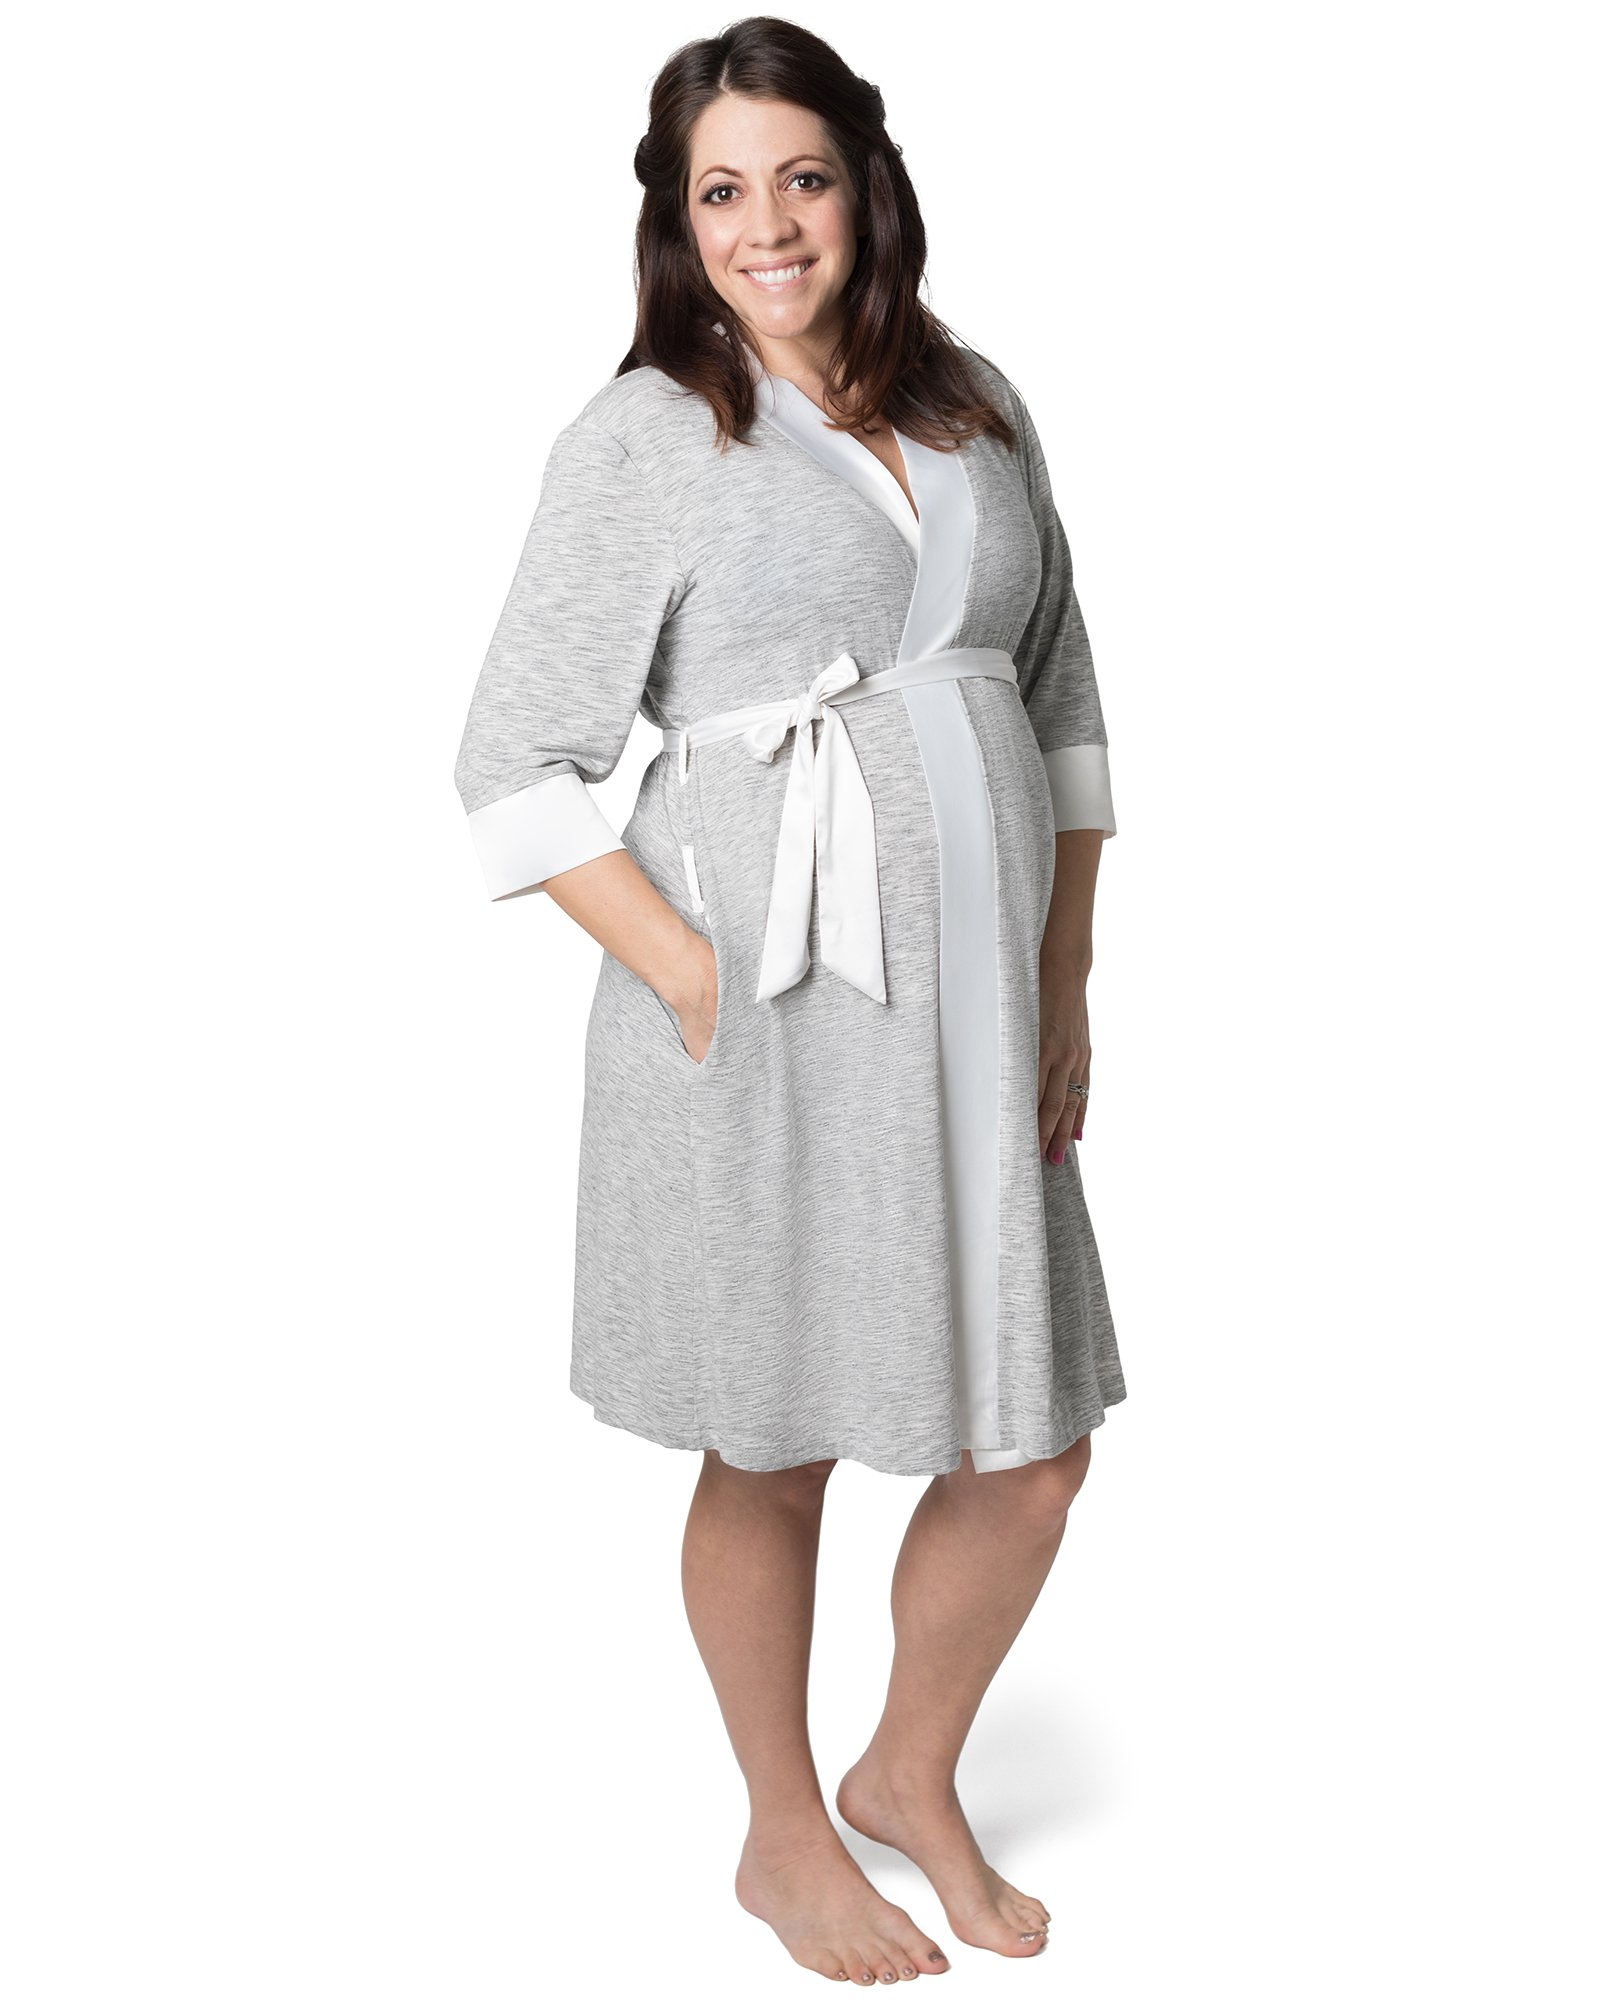 Kindred Bravely Emmaline Maternity & Nursing Robe Hospital Bag/Delivery Essential (Grey, Small/Medium)